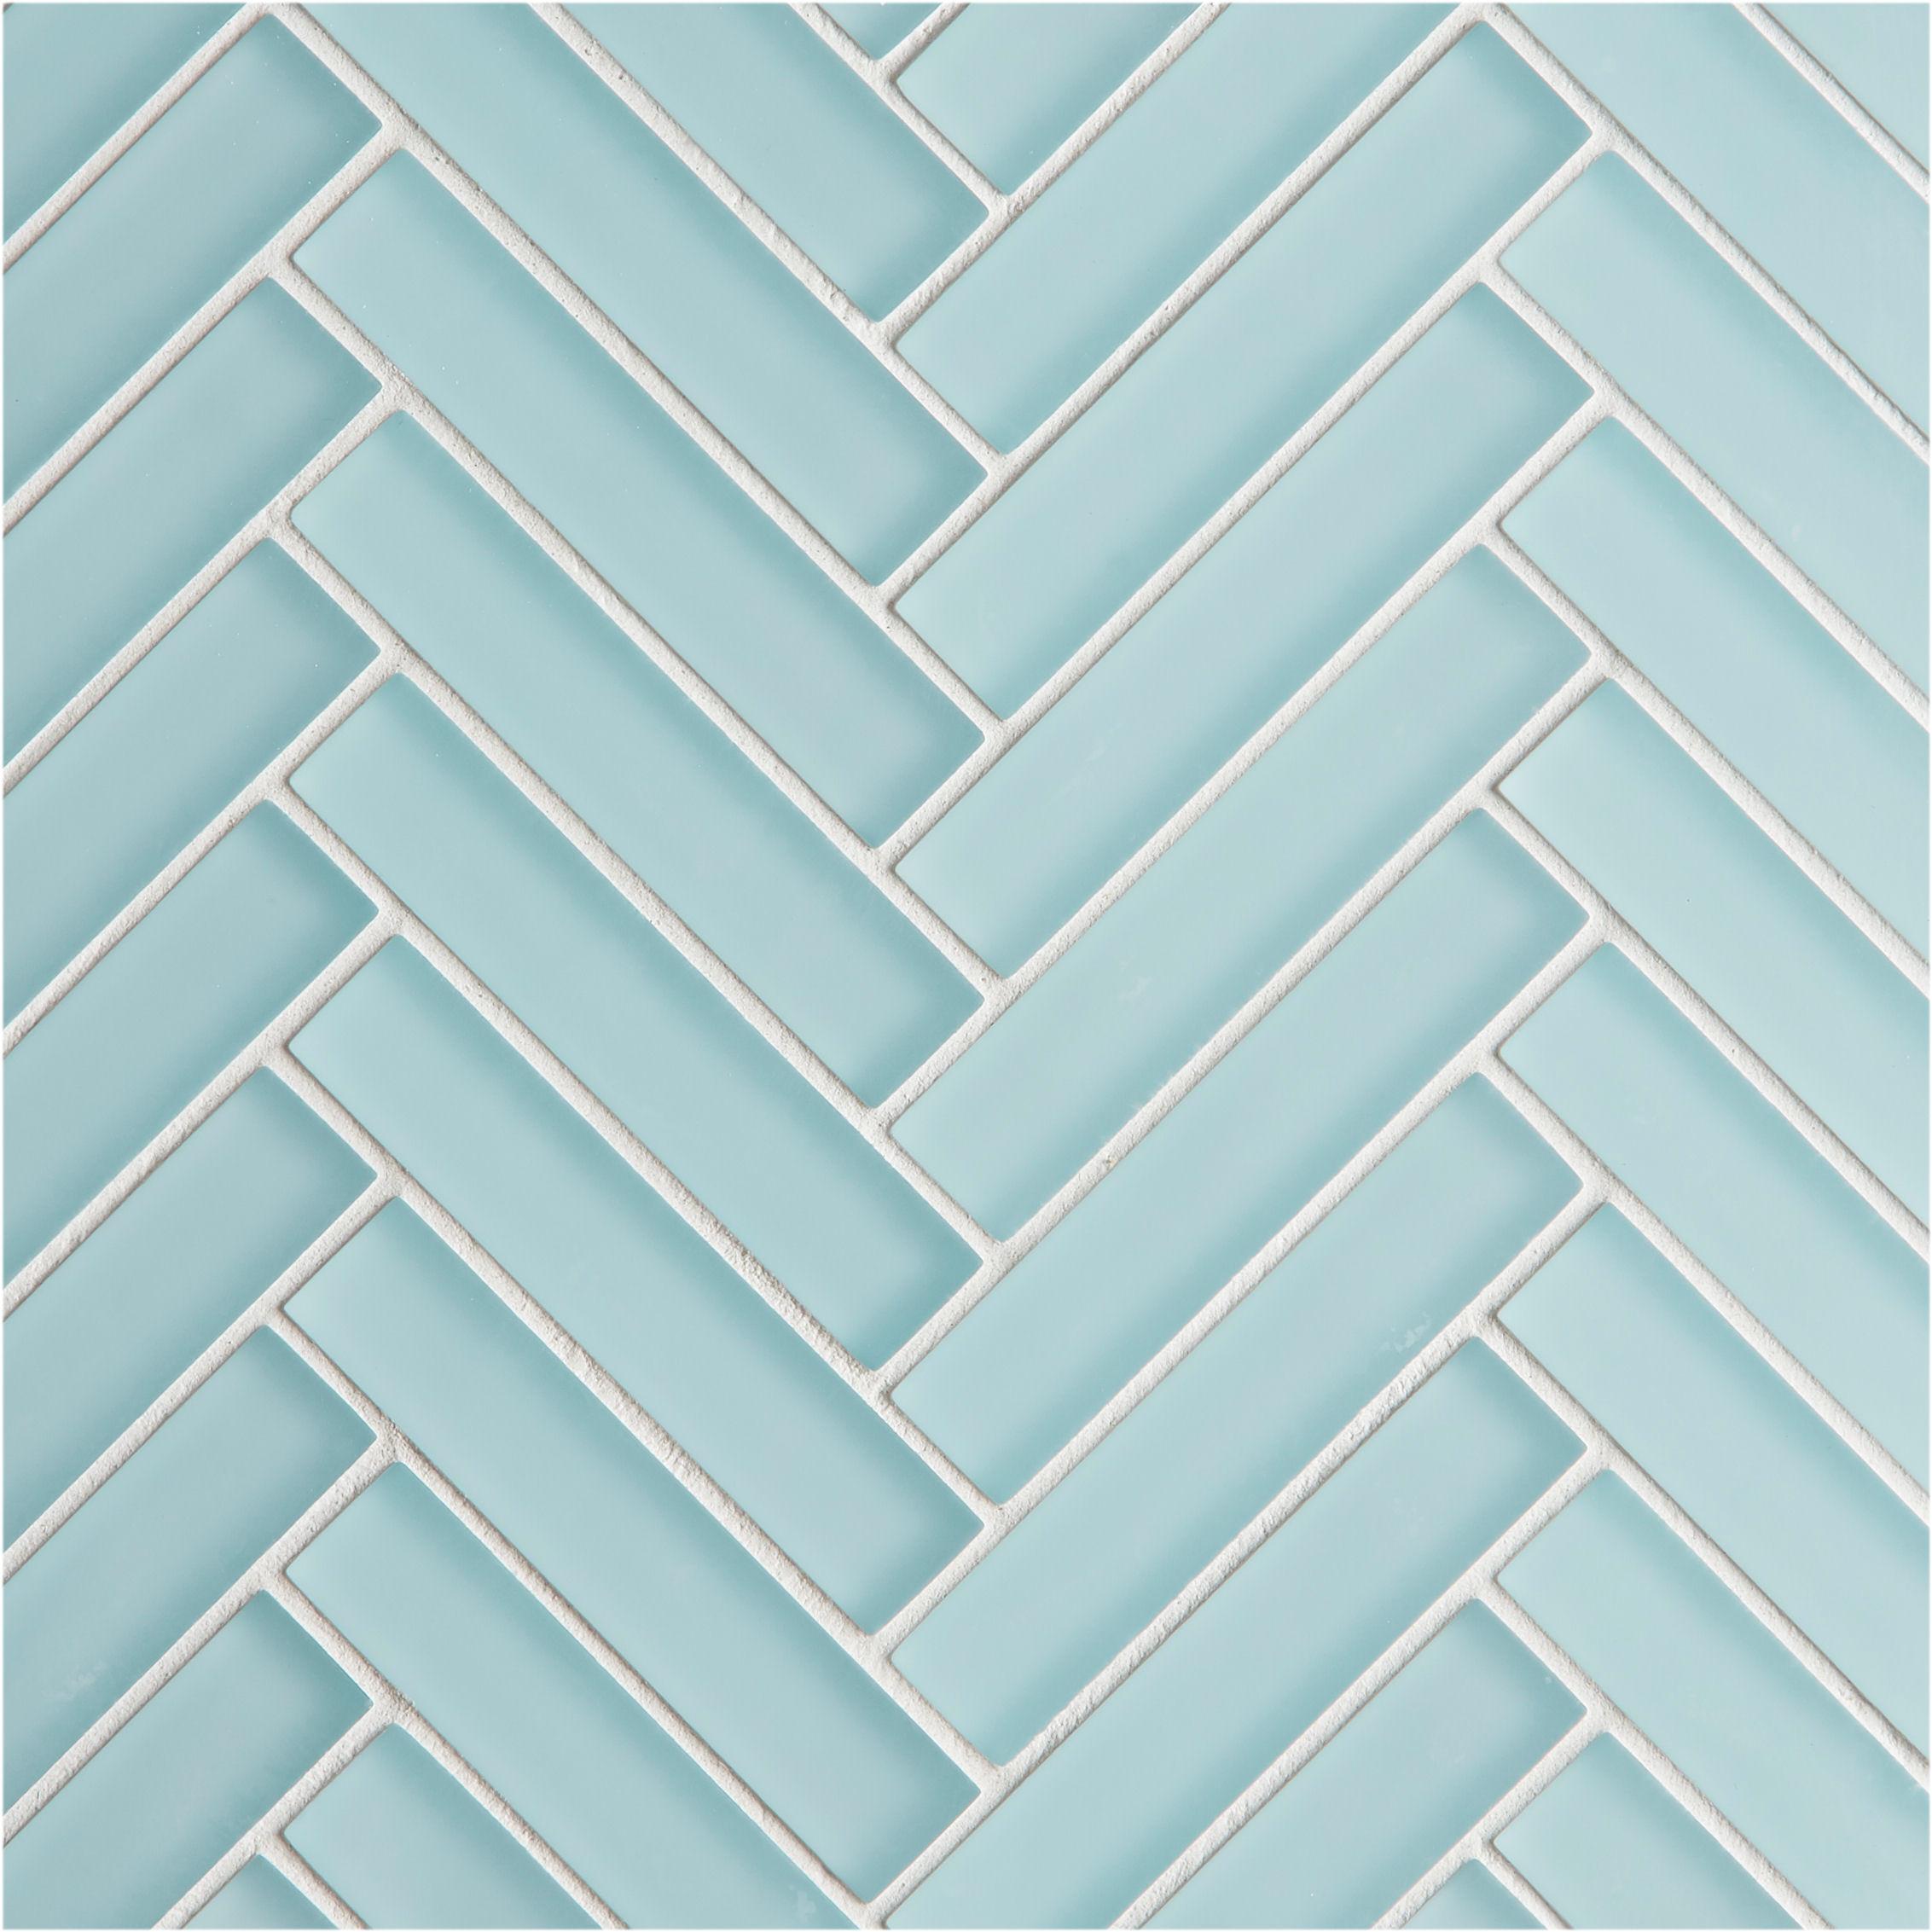 Glacier Blue Glass Herringbone Mosaic Tile